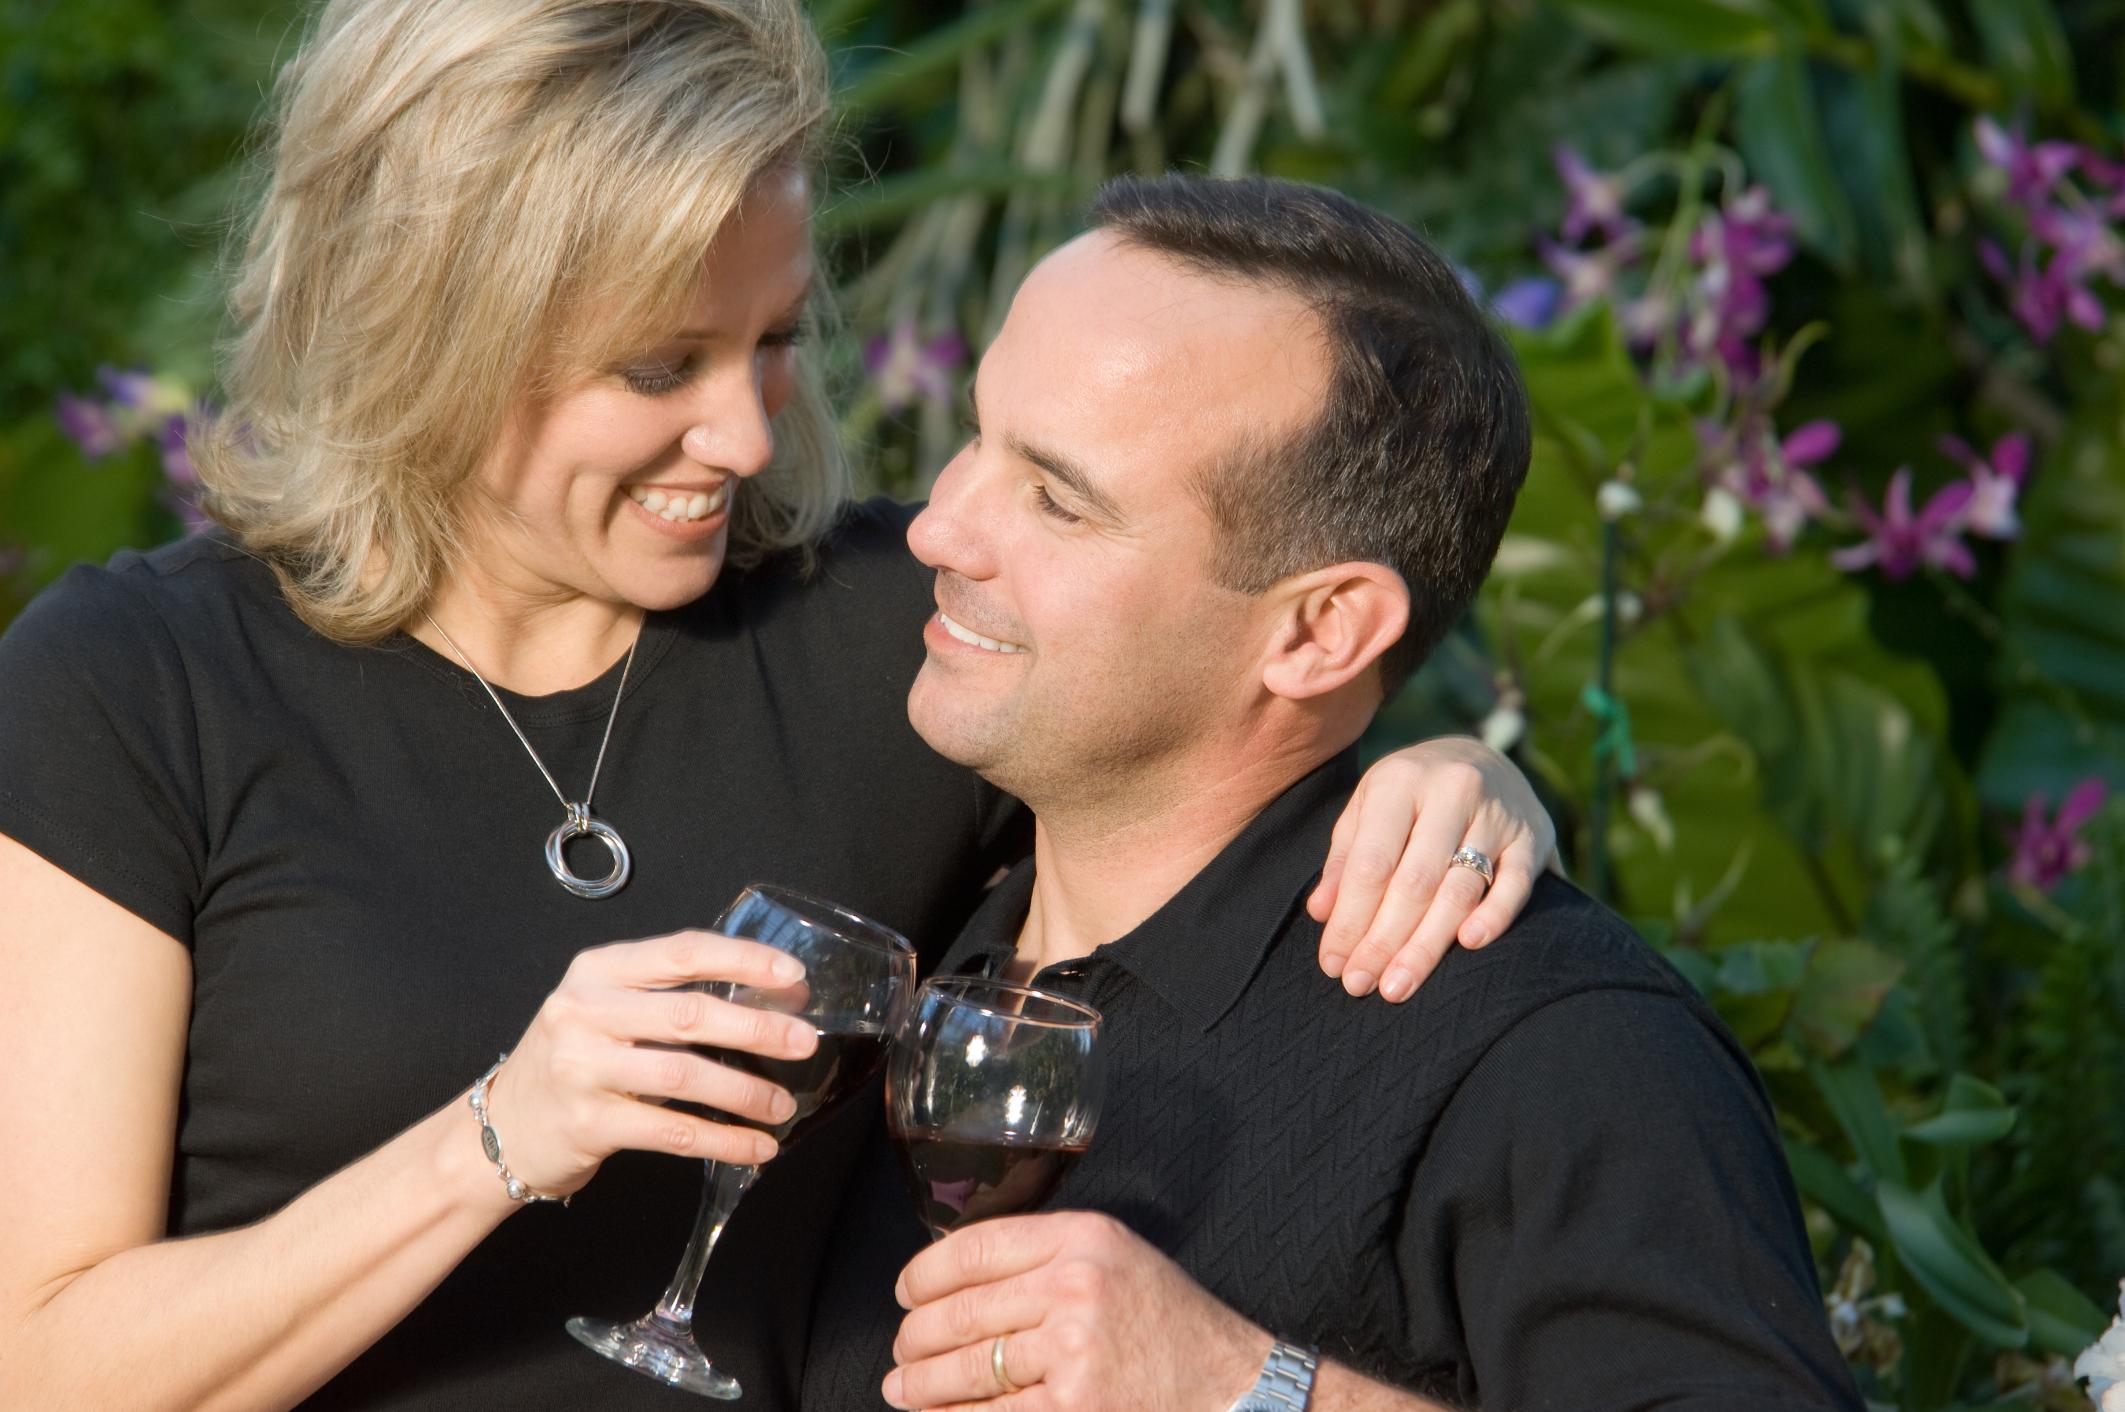 6th Wedding Anniversary Sugar Gifts: Traditional Six Year Anniversary Gifts